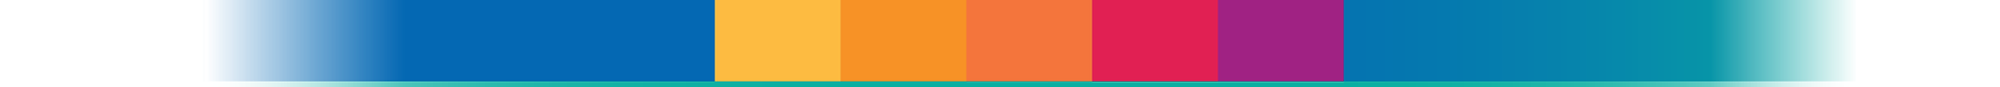 excel academics brand colours